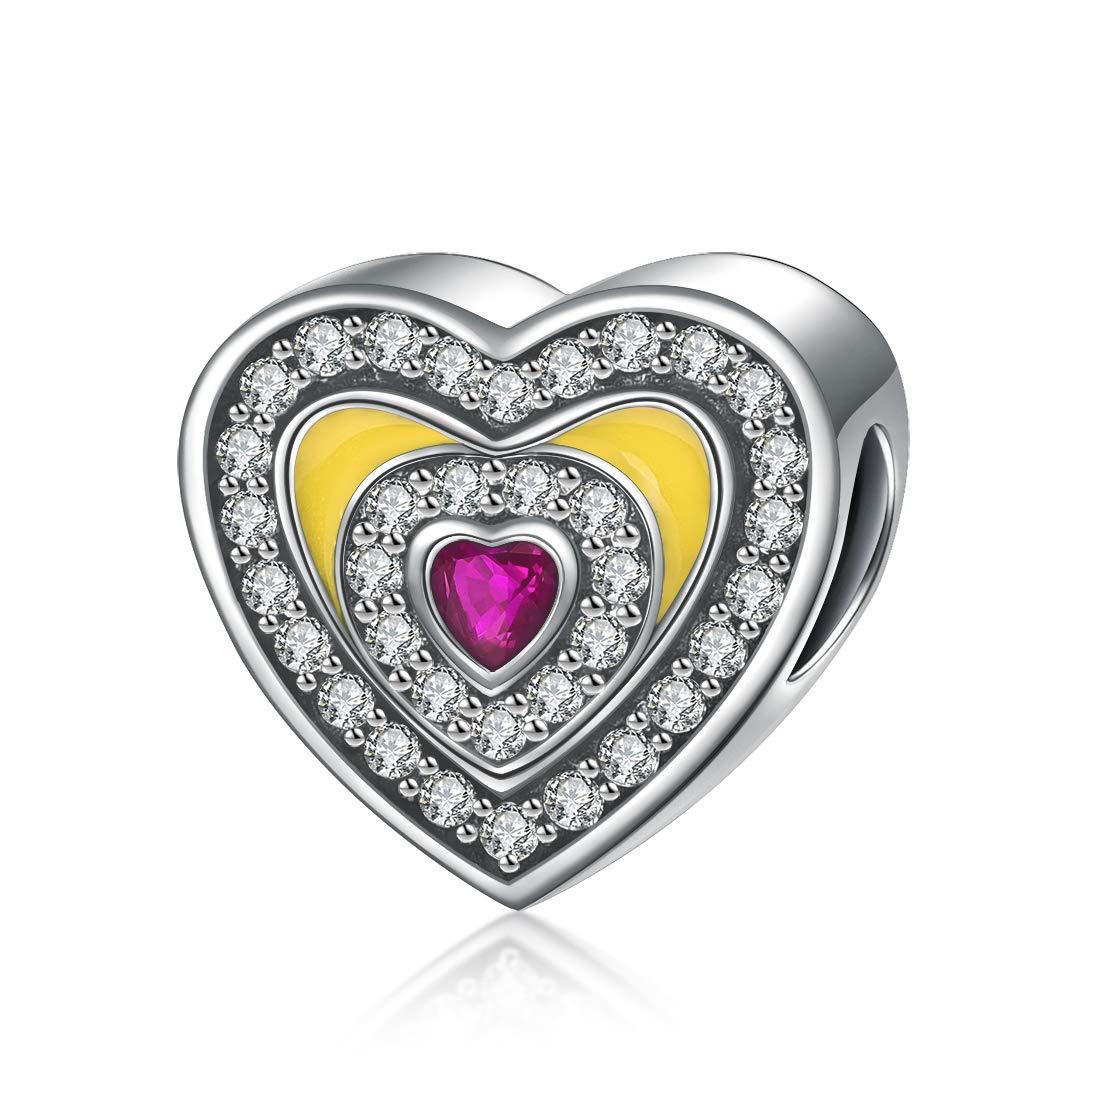 DALARAN 925 Sterling Silber Liebe Perlen Frauen Feine Schmuck Geschenke Anhänger